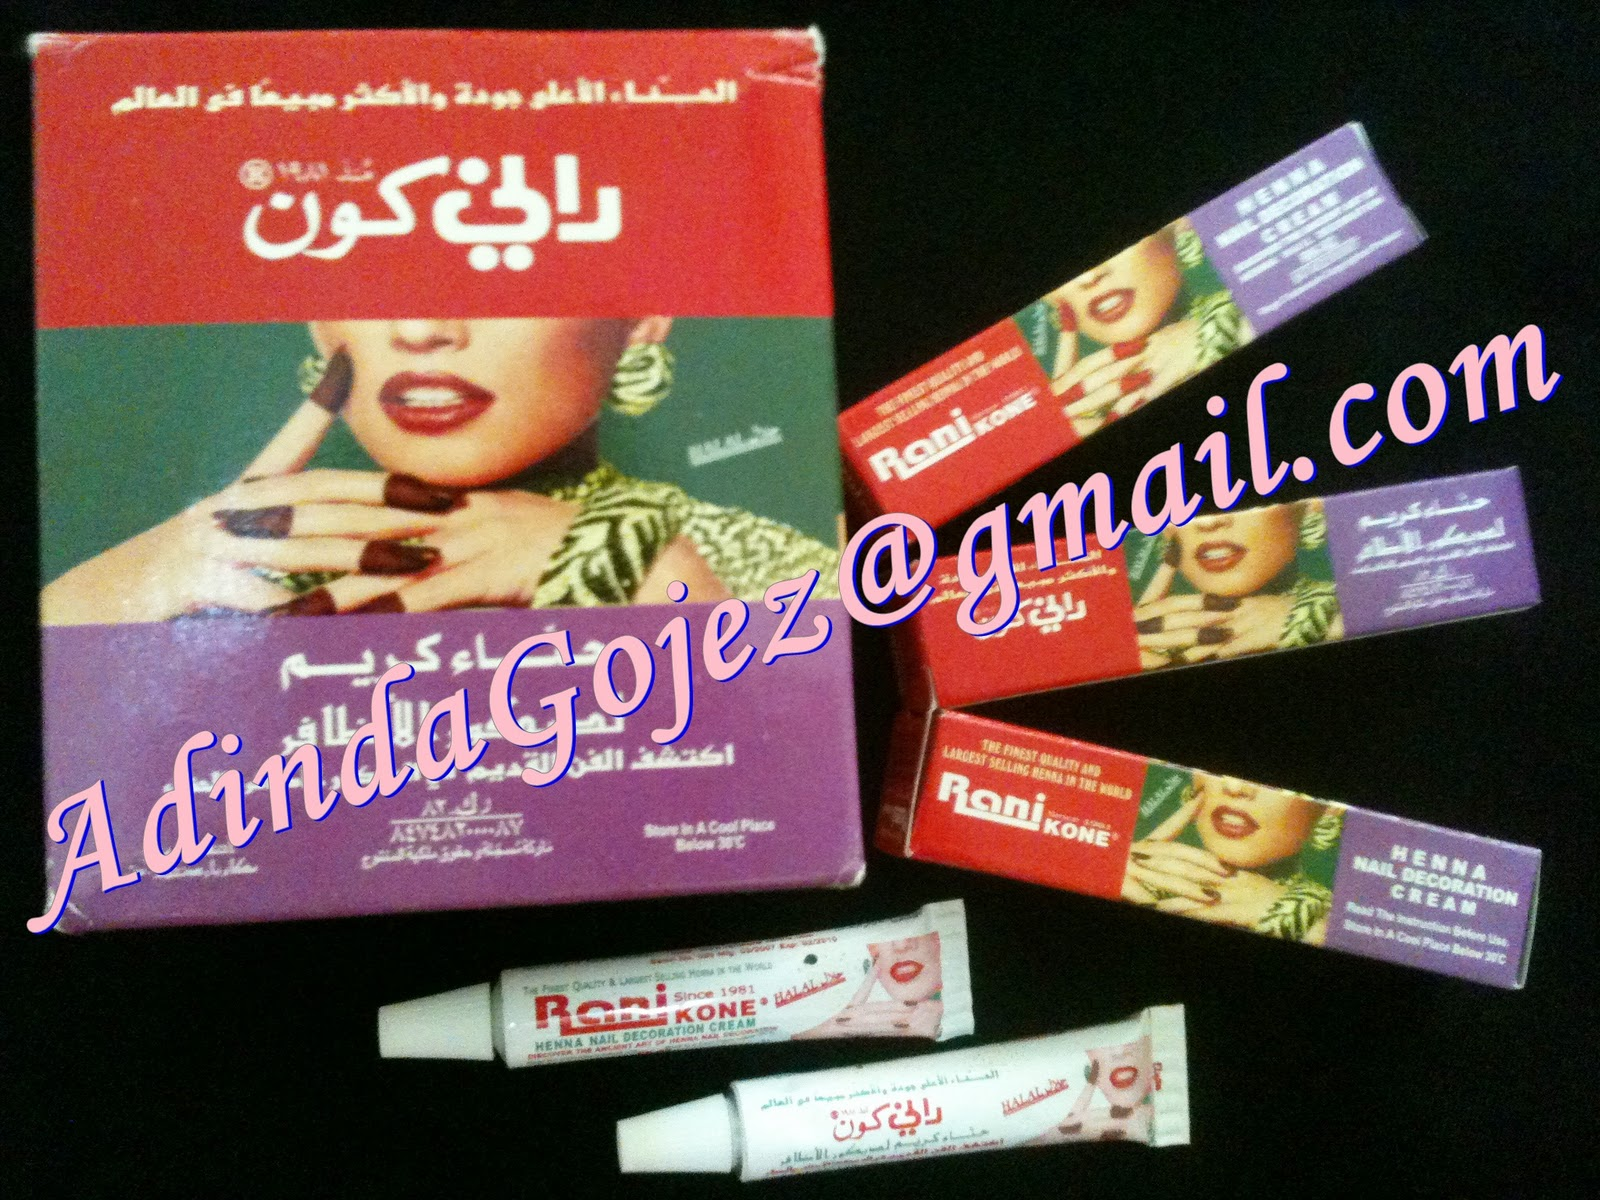 Adinda Gojez Fashion Amp Beauty Inai Express Halal Cepat Cantik